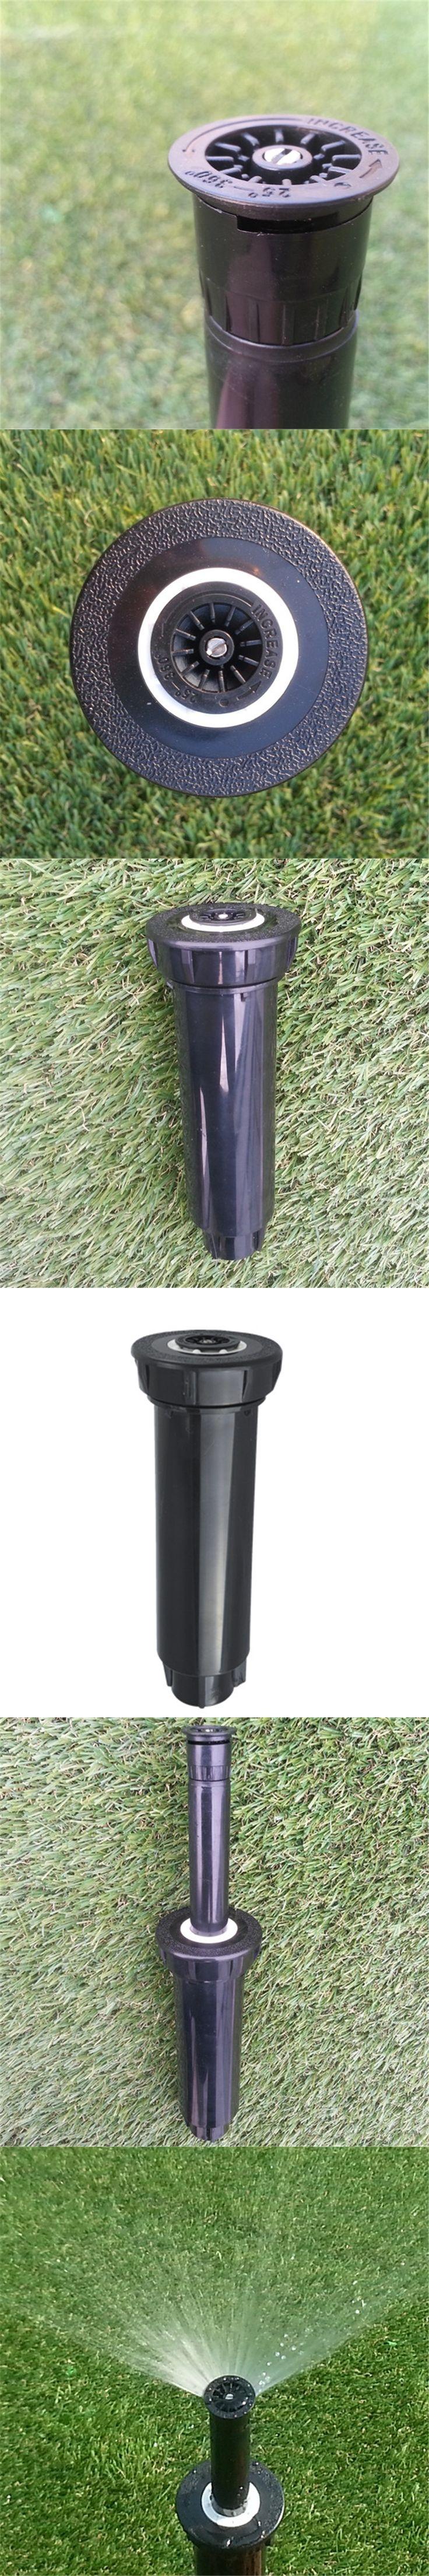 "10 Pcs/set 1/2"" BSP 25-360 Degrees Plastic Popup Sprinklers Lawn Sprinklers Irrigation Garden Supplies Lawn Irrigation 31505F-10"